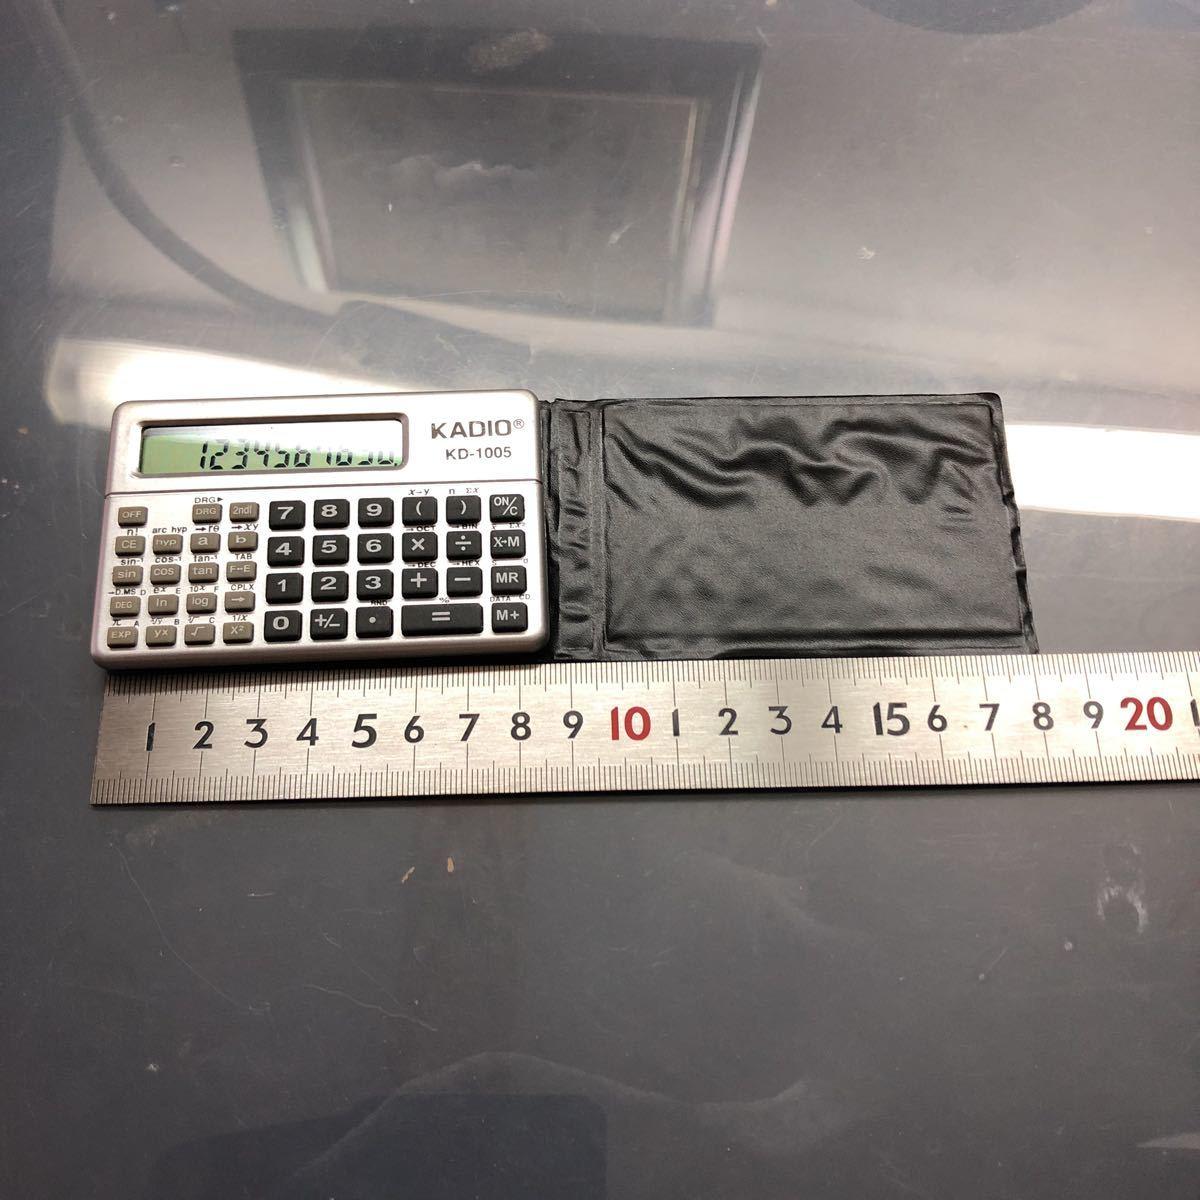 KADIO KD-1005 物凄く小さい関数電卓中古美品_画像4